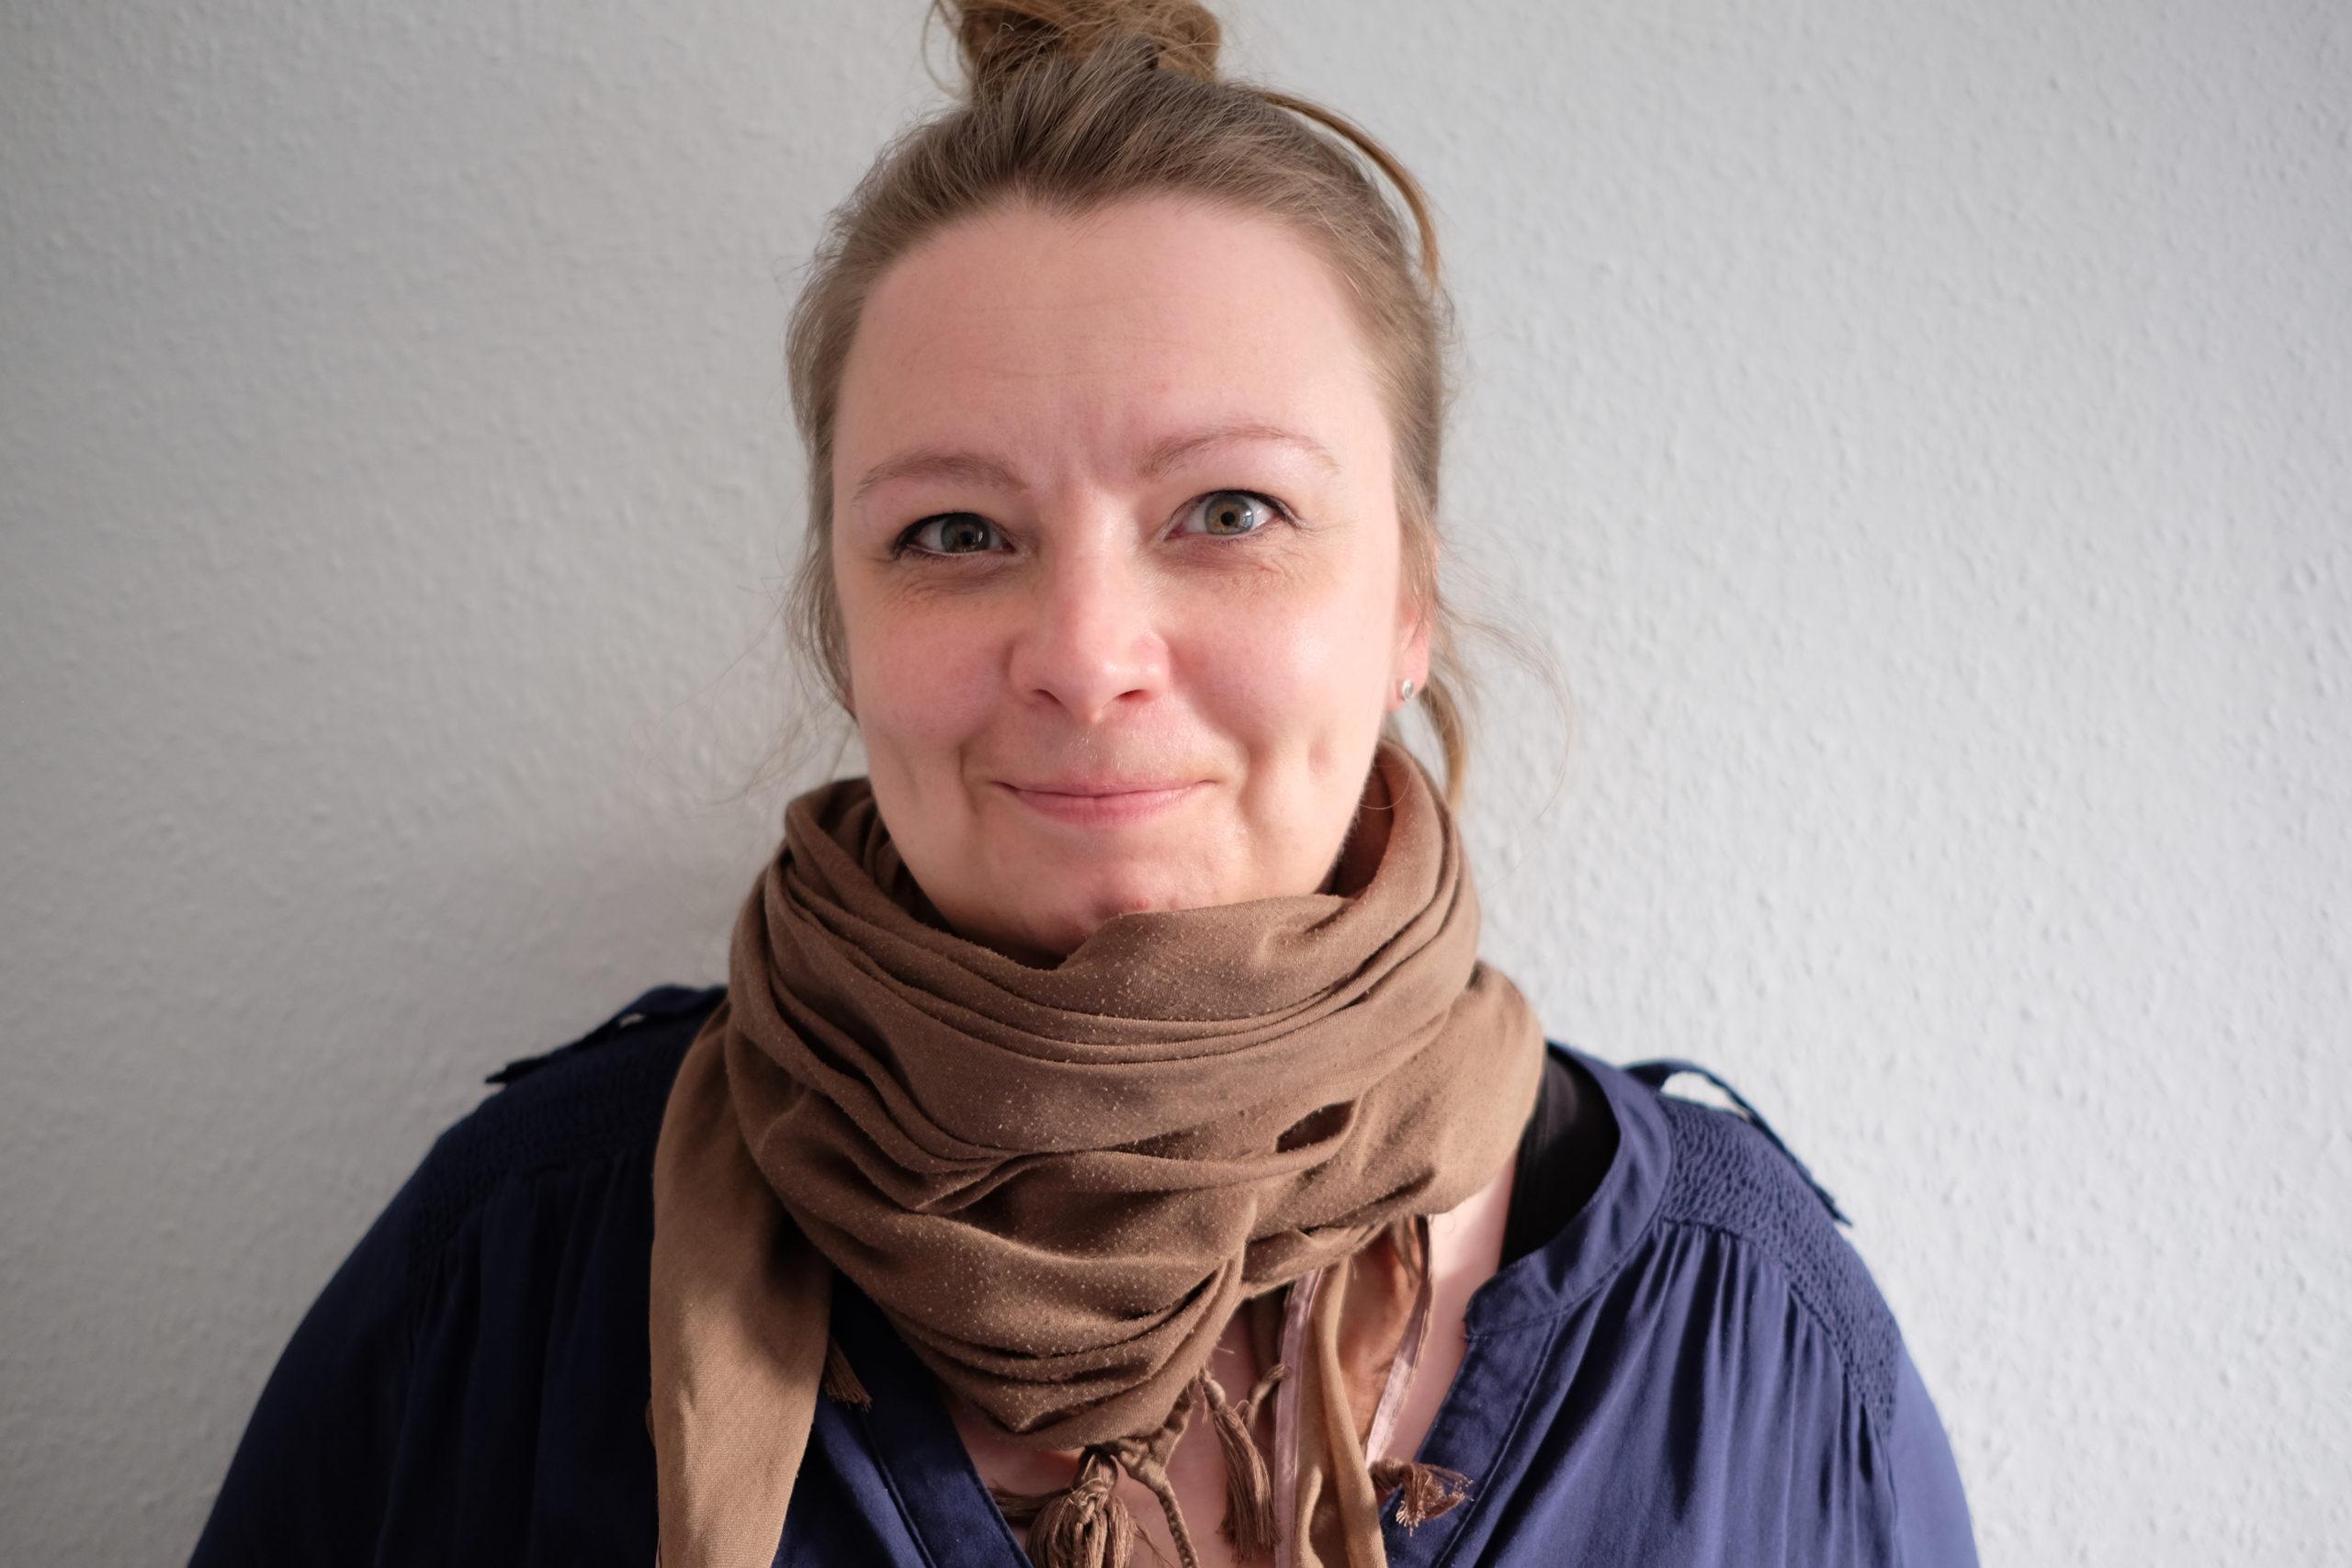 Jennifer Barg